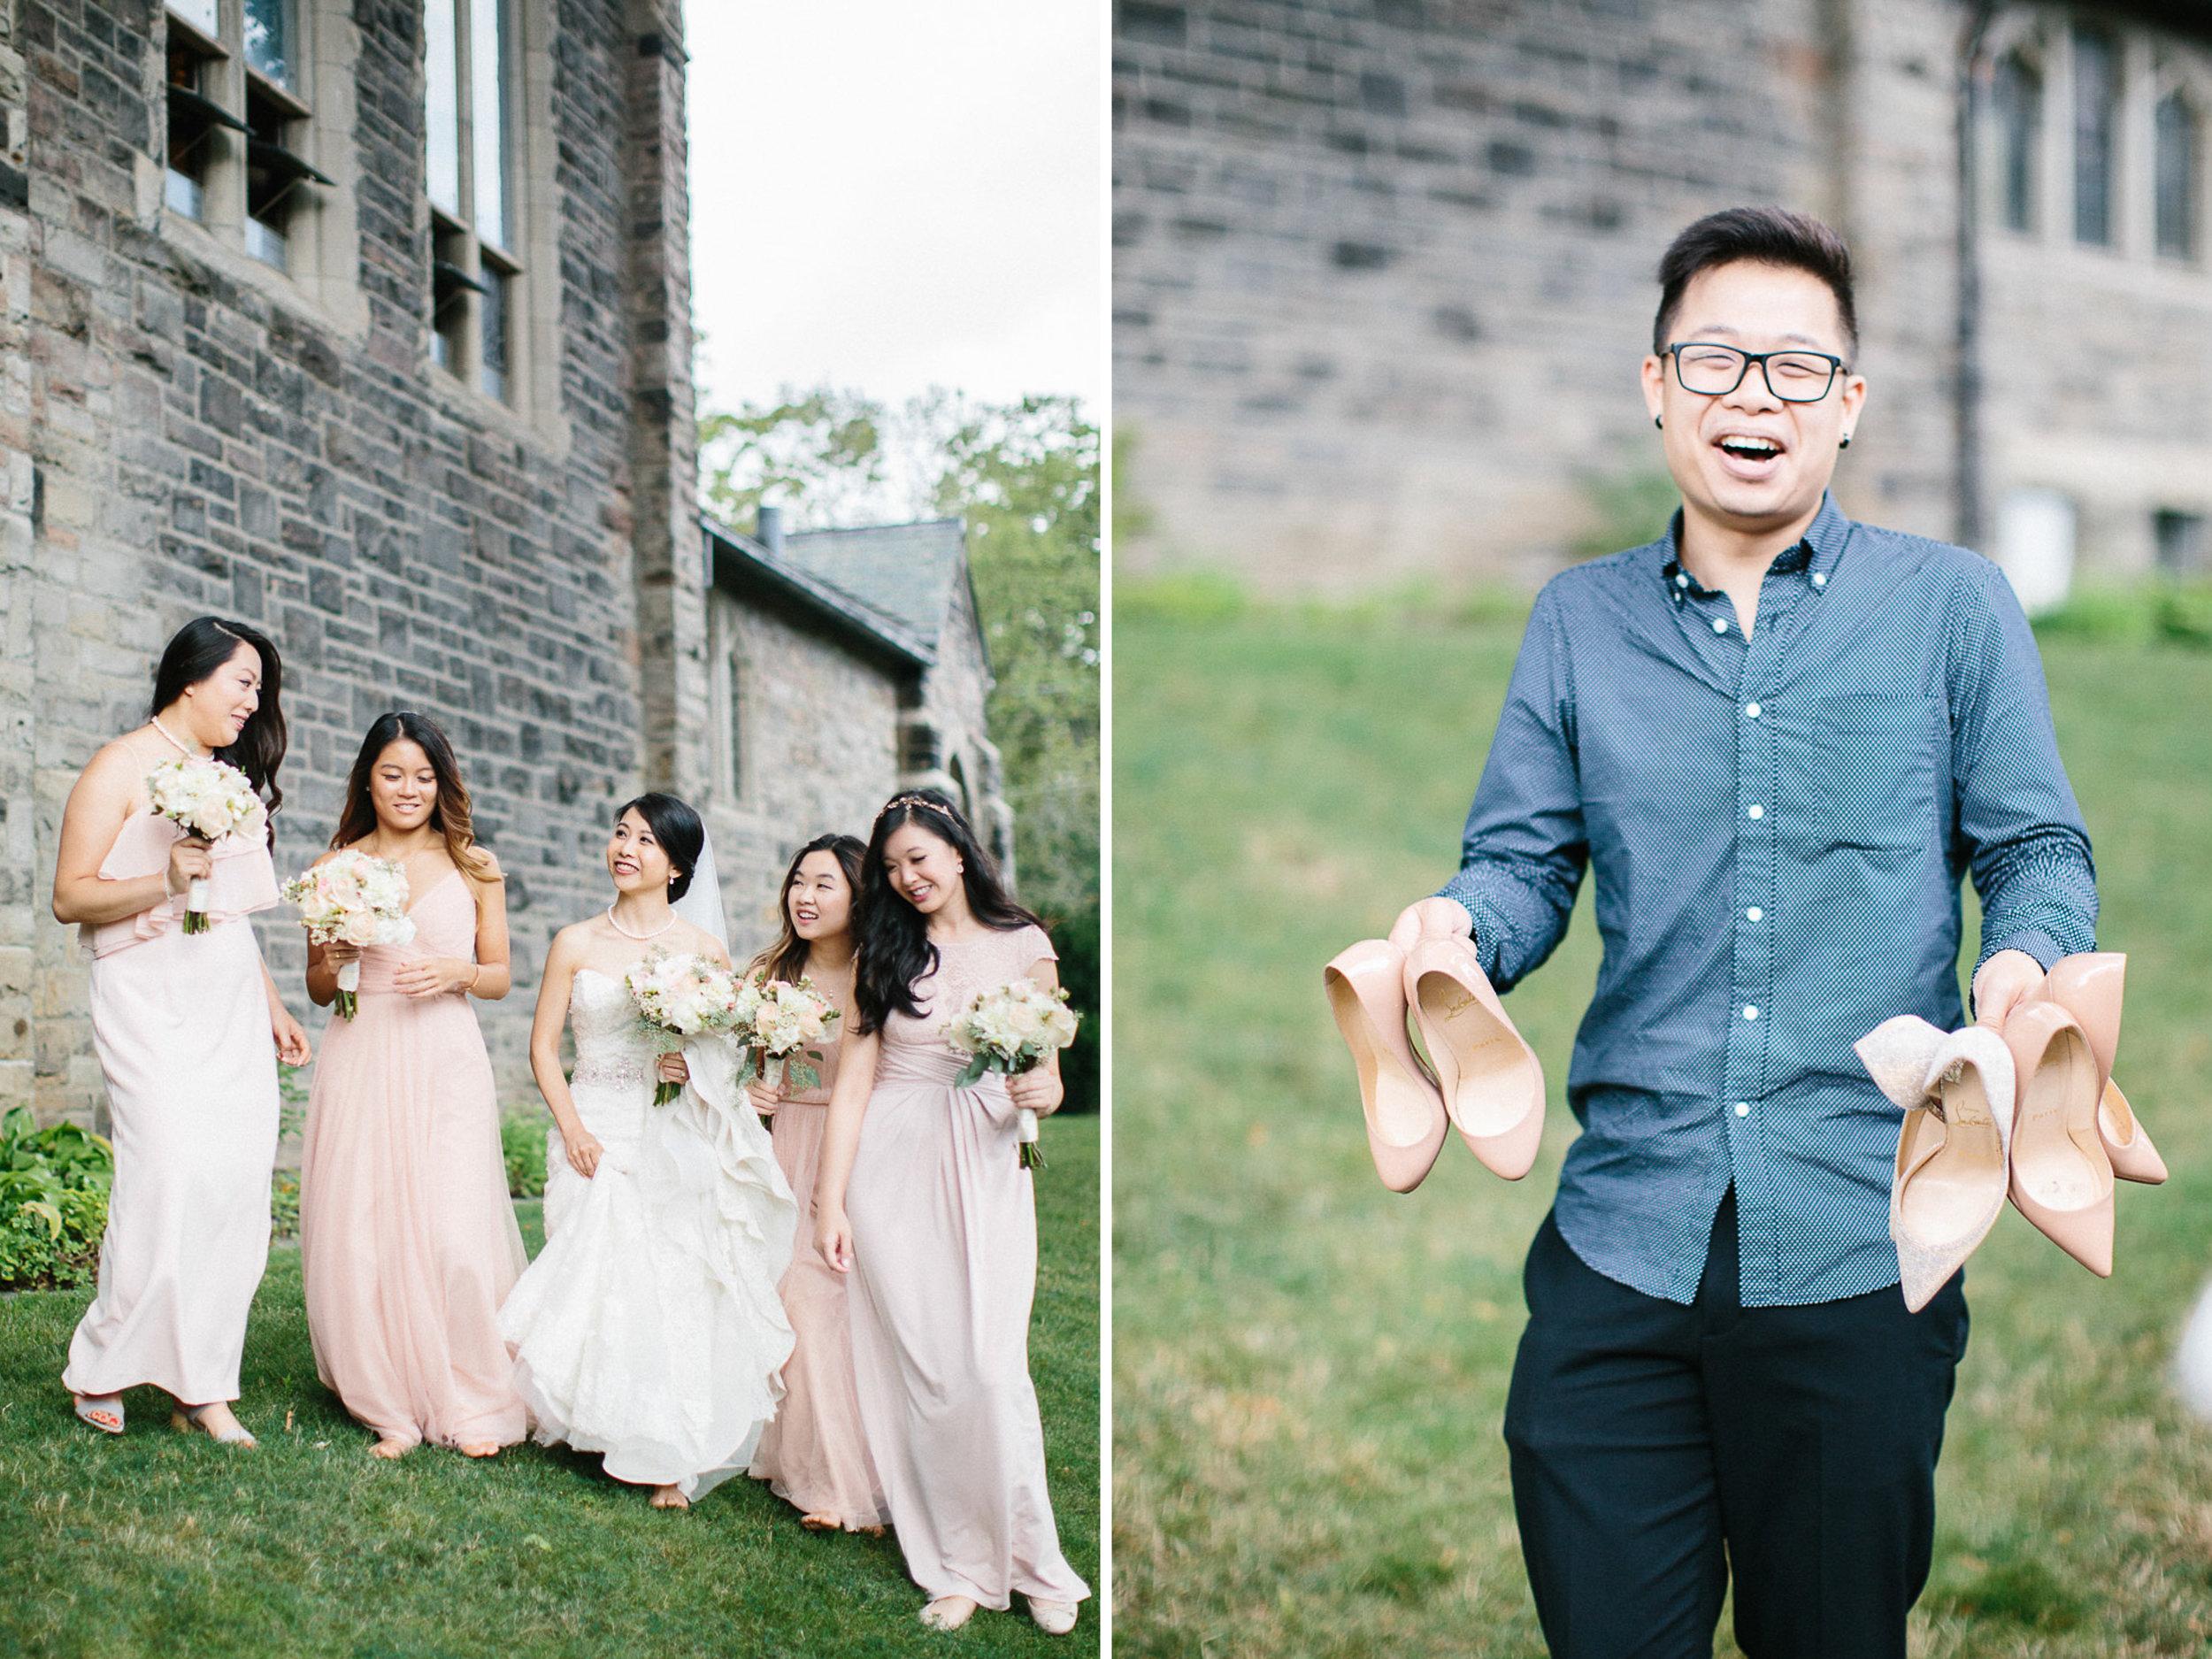 toronto_wedding_photographer_reference_library11.jpg